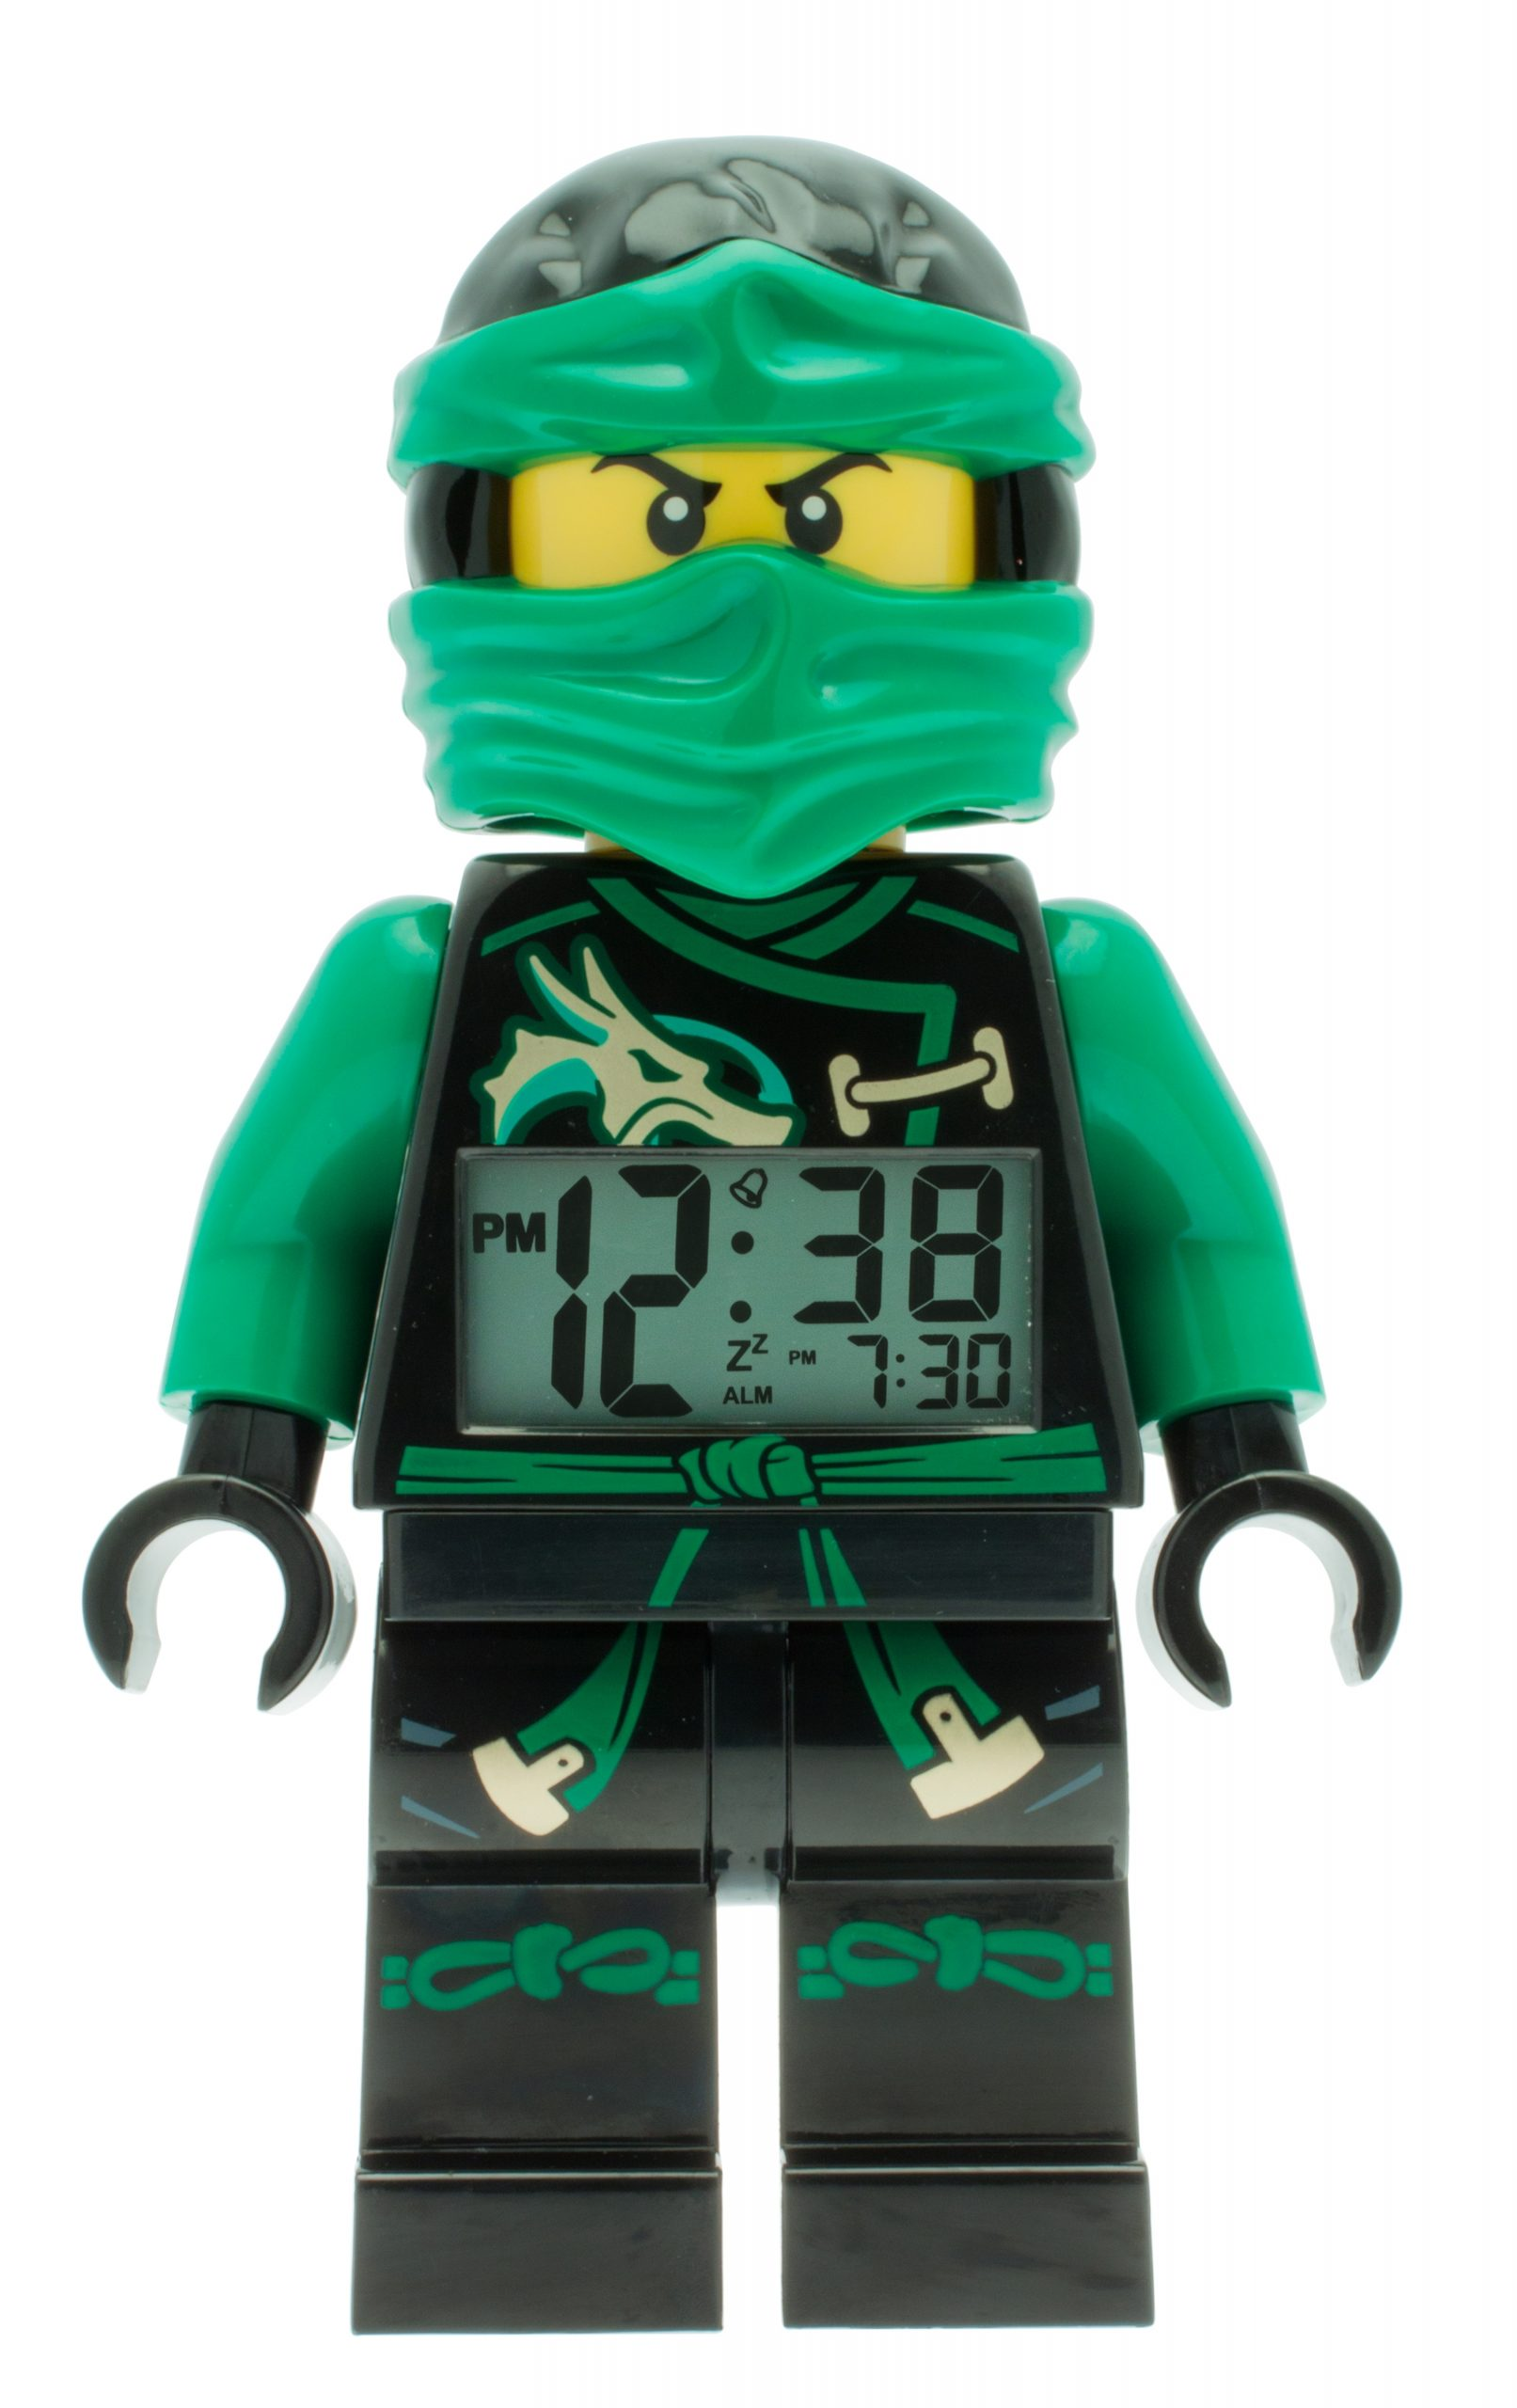 lego 5005118 ninjago sky pirates lloyd minifigure alarm clock scaled